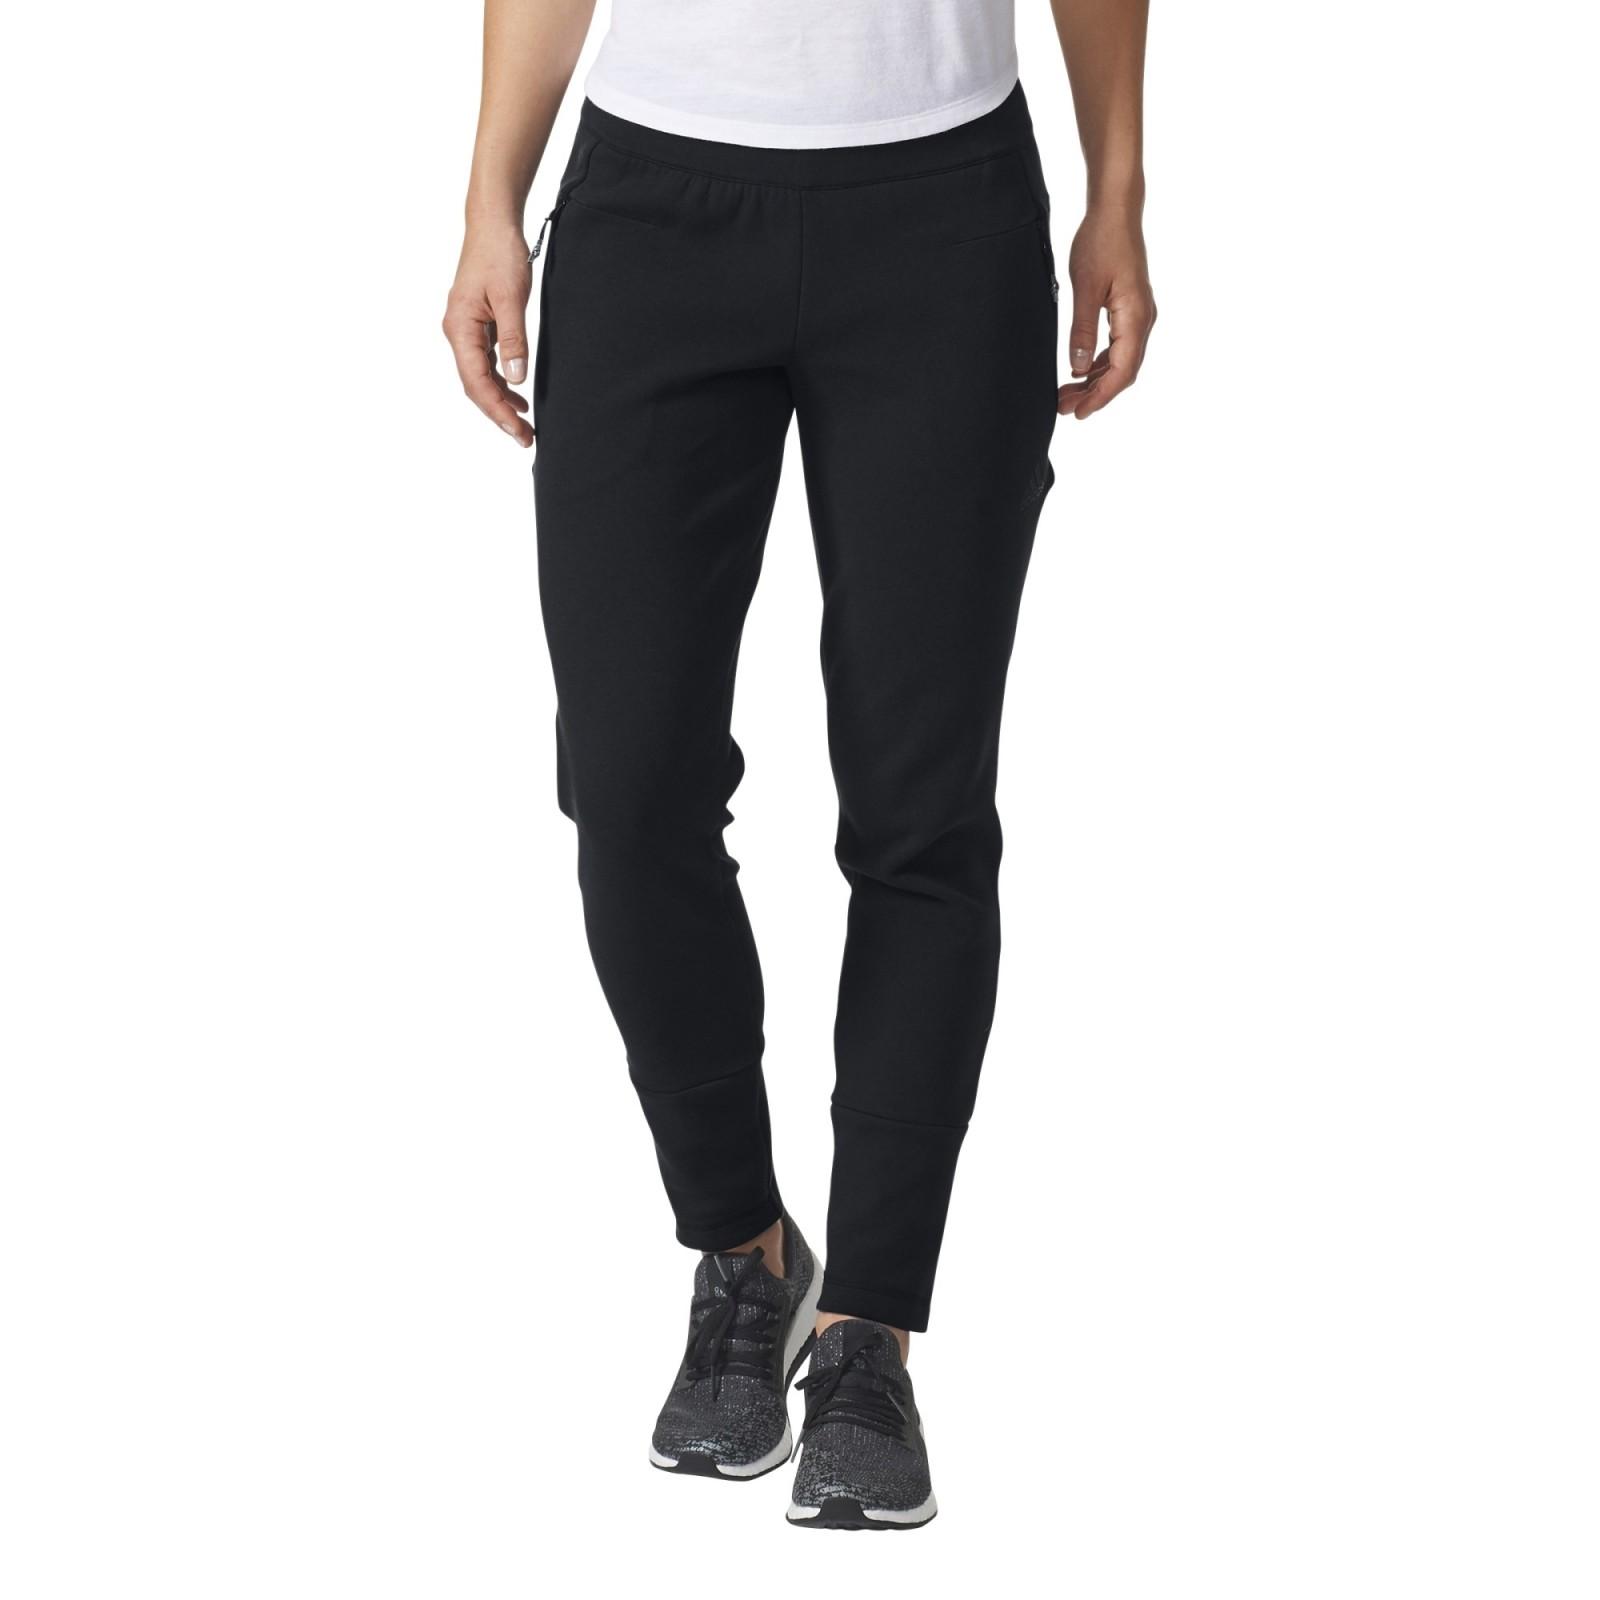 Dámské tepláky adidas Performance ZNE SLIM PANT BLACK. Dámské tepláky  adidas Performance ZNE SLIM PANT BLACK. Dámské tepláky adidas ... 2325c661462